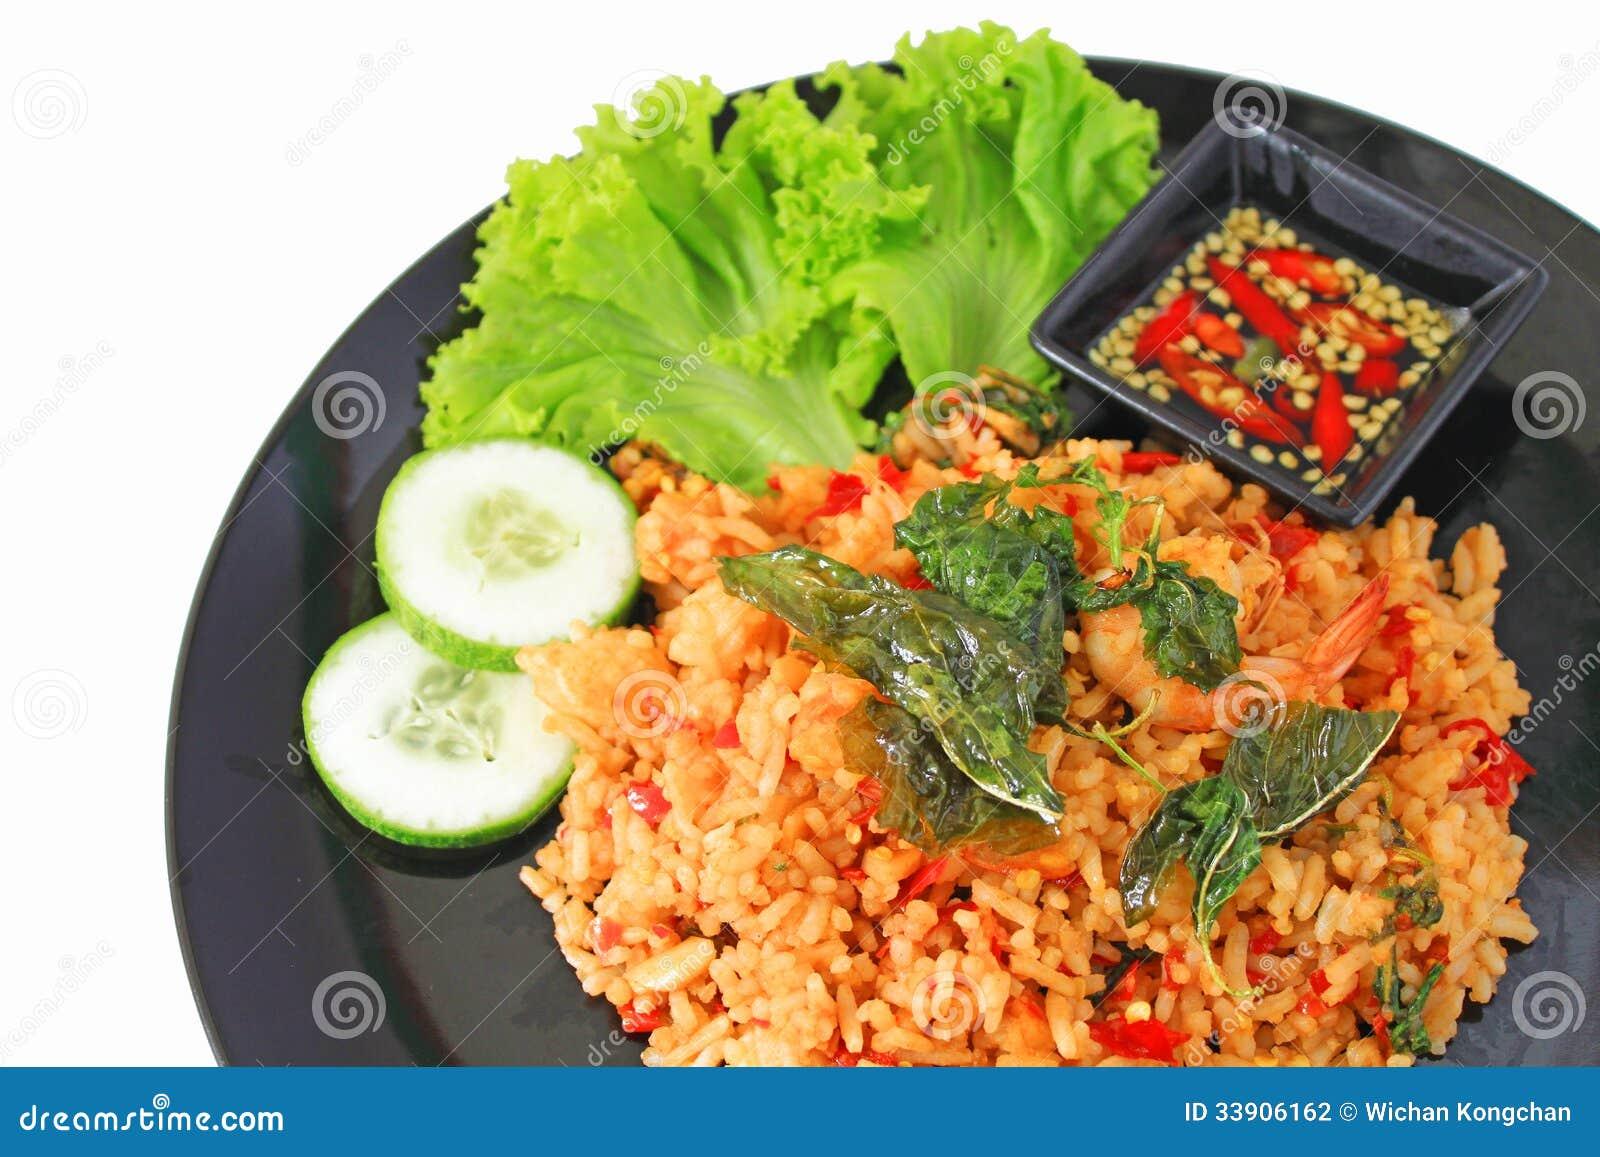 Thai Spicy Food Basil Shrimp Fried Rice Recipe Stock Photography ...